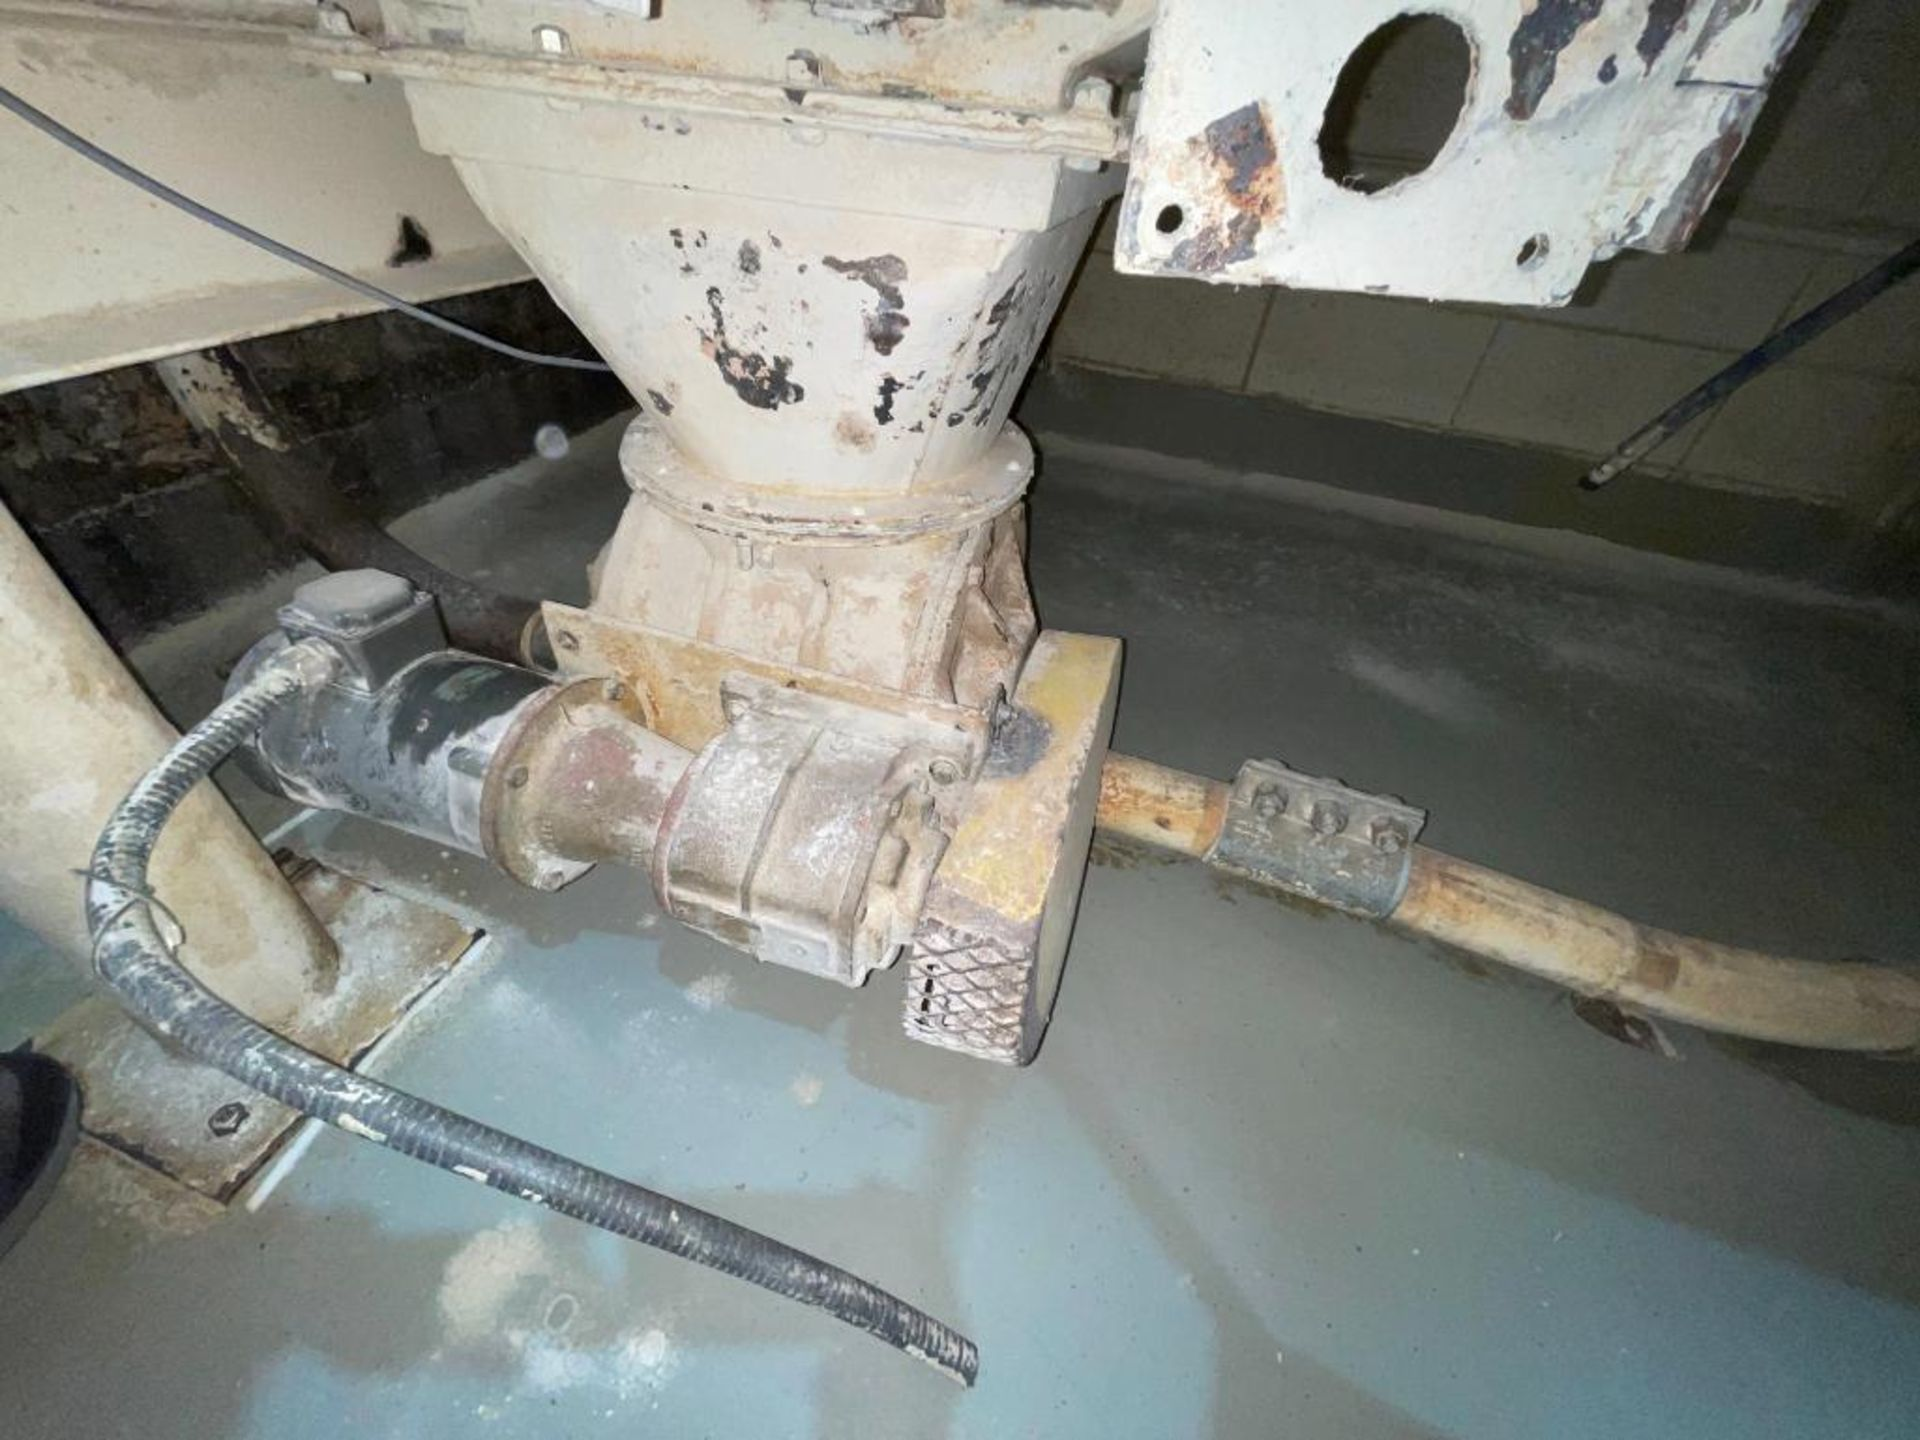 mild steel single screw blender - Image 10 of 14